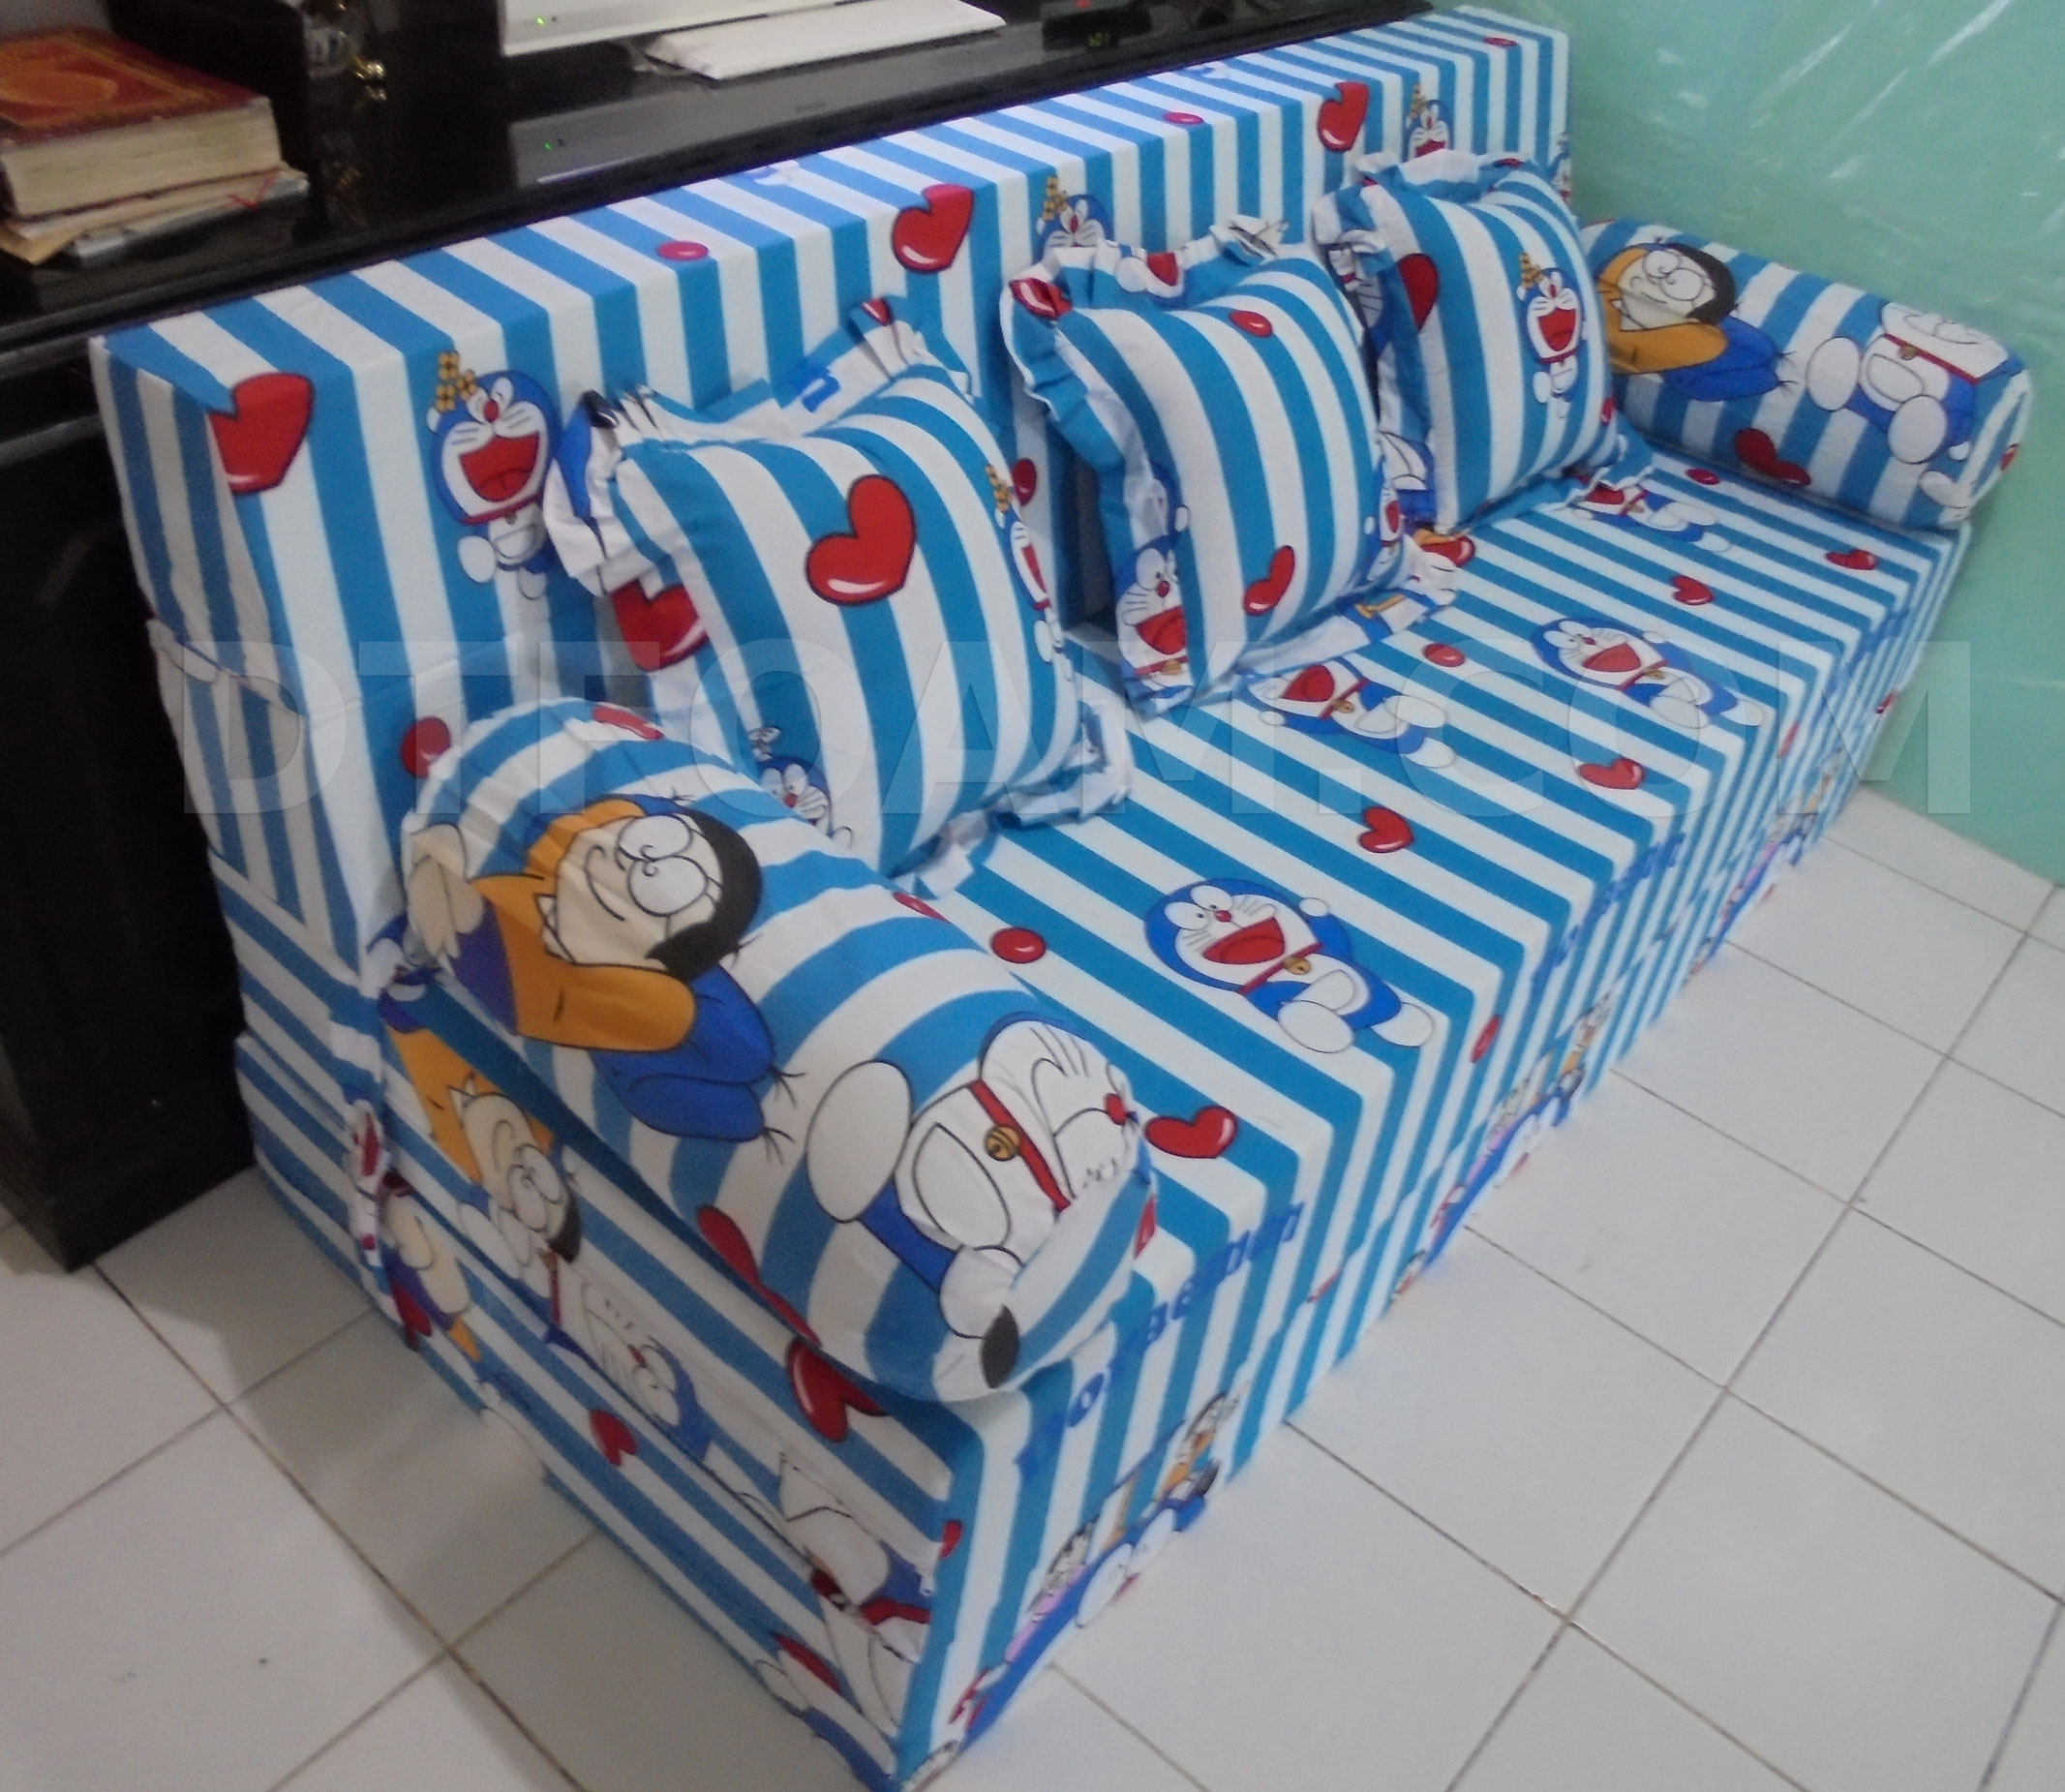 sofa bed kasur busa lipat inoac jakarta high point factory florence south carolina jual baci living room